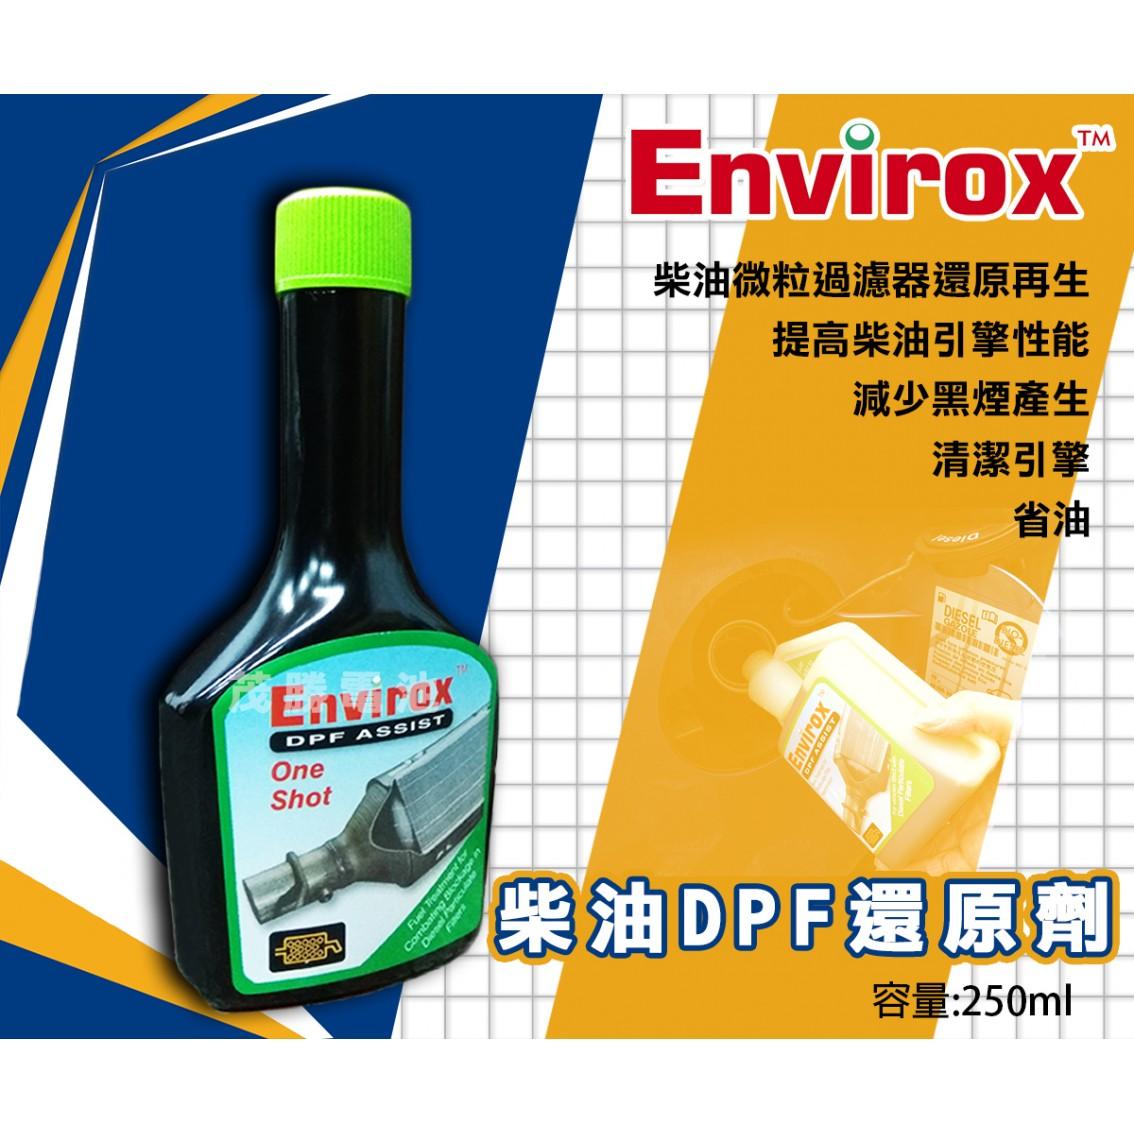 Envirox 柴油DPF還原劑 250ML